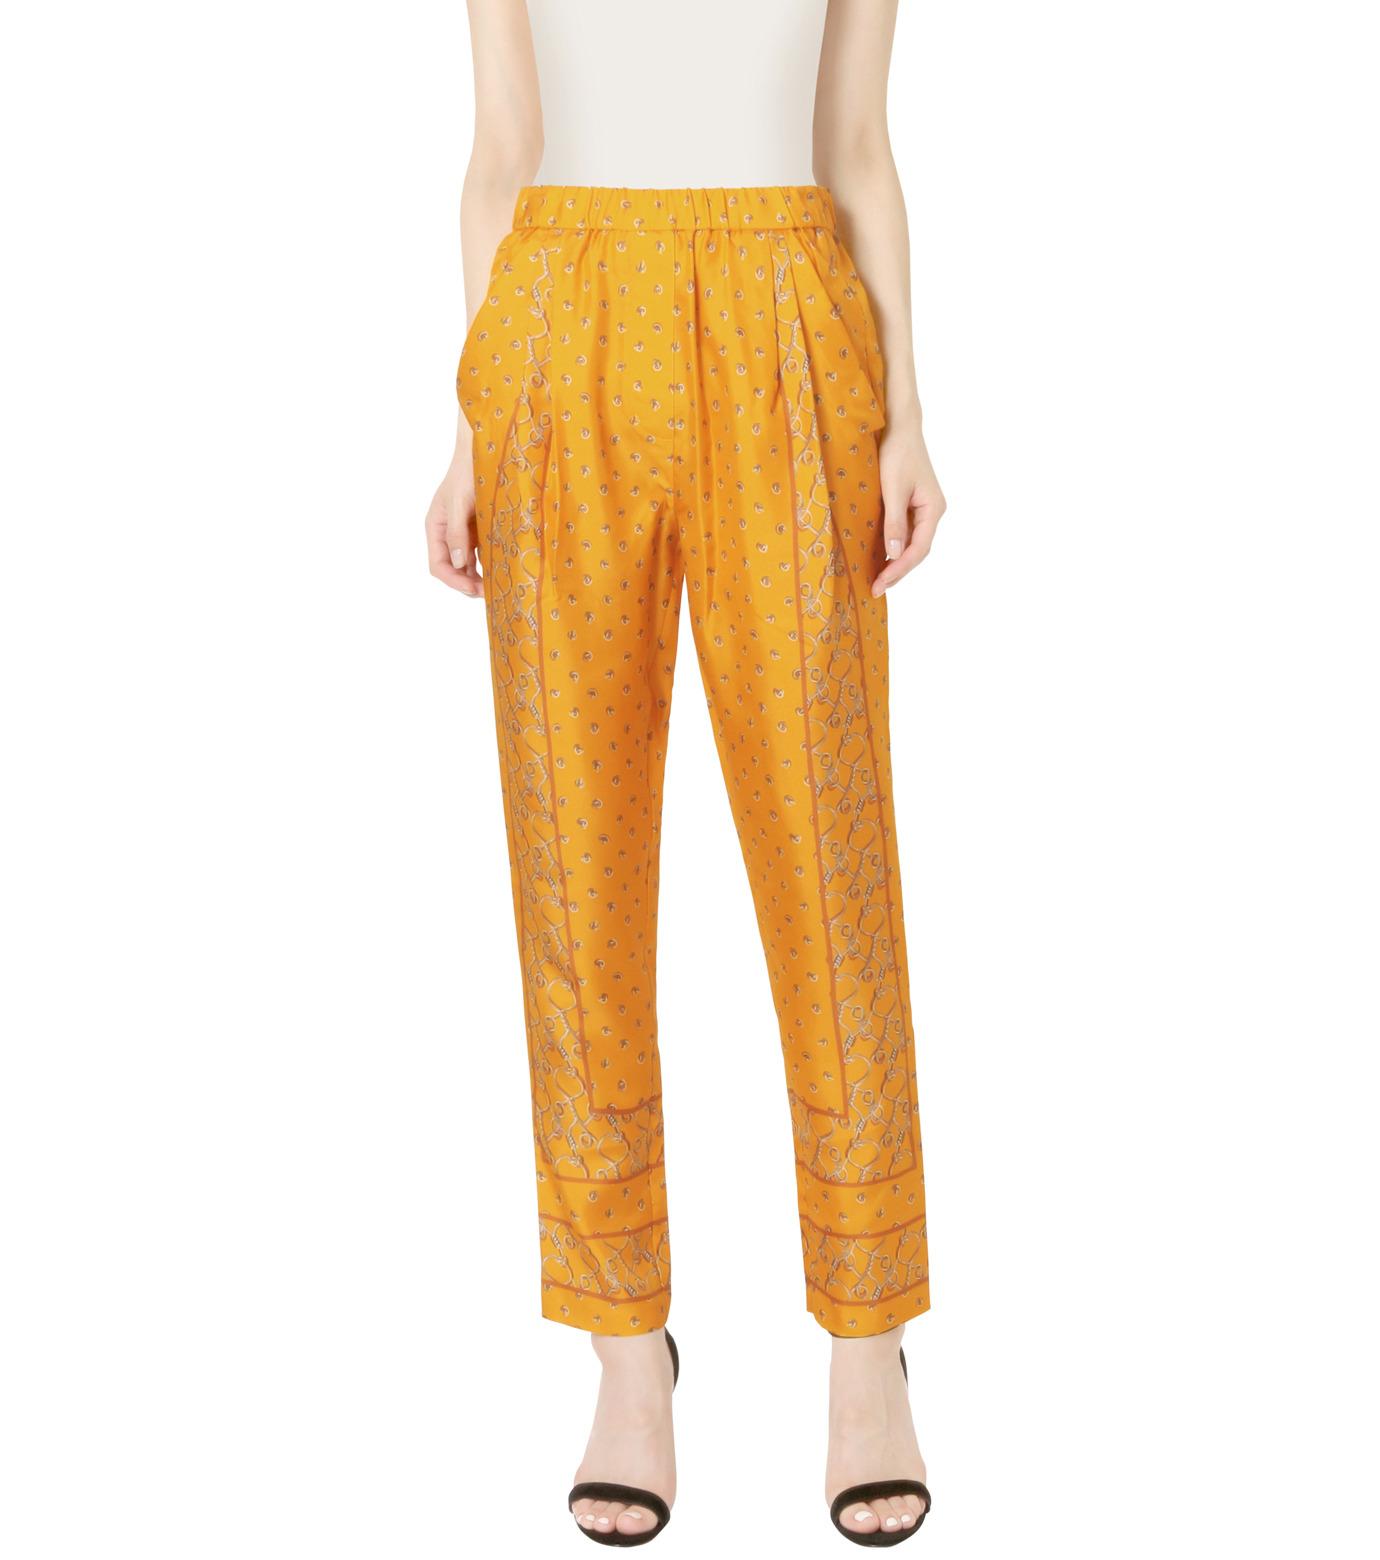 3.1 Phillip Lim(スリーワン フィリップリム)のScarf Print Tapered Trouser-YELLOW(パンツ/pants)-P161-5447BKP-32 拡大詳細画像1